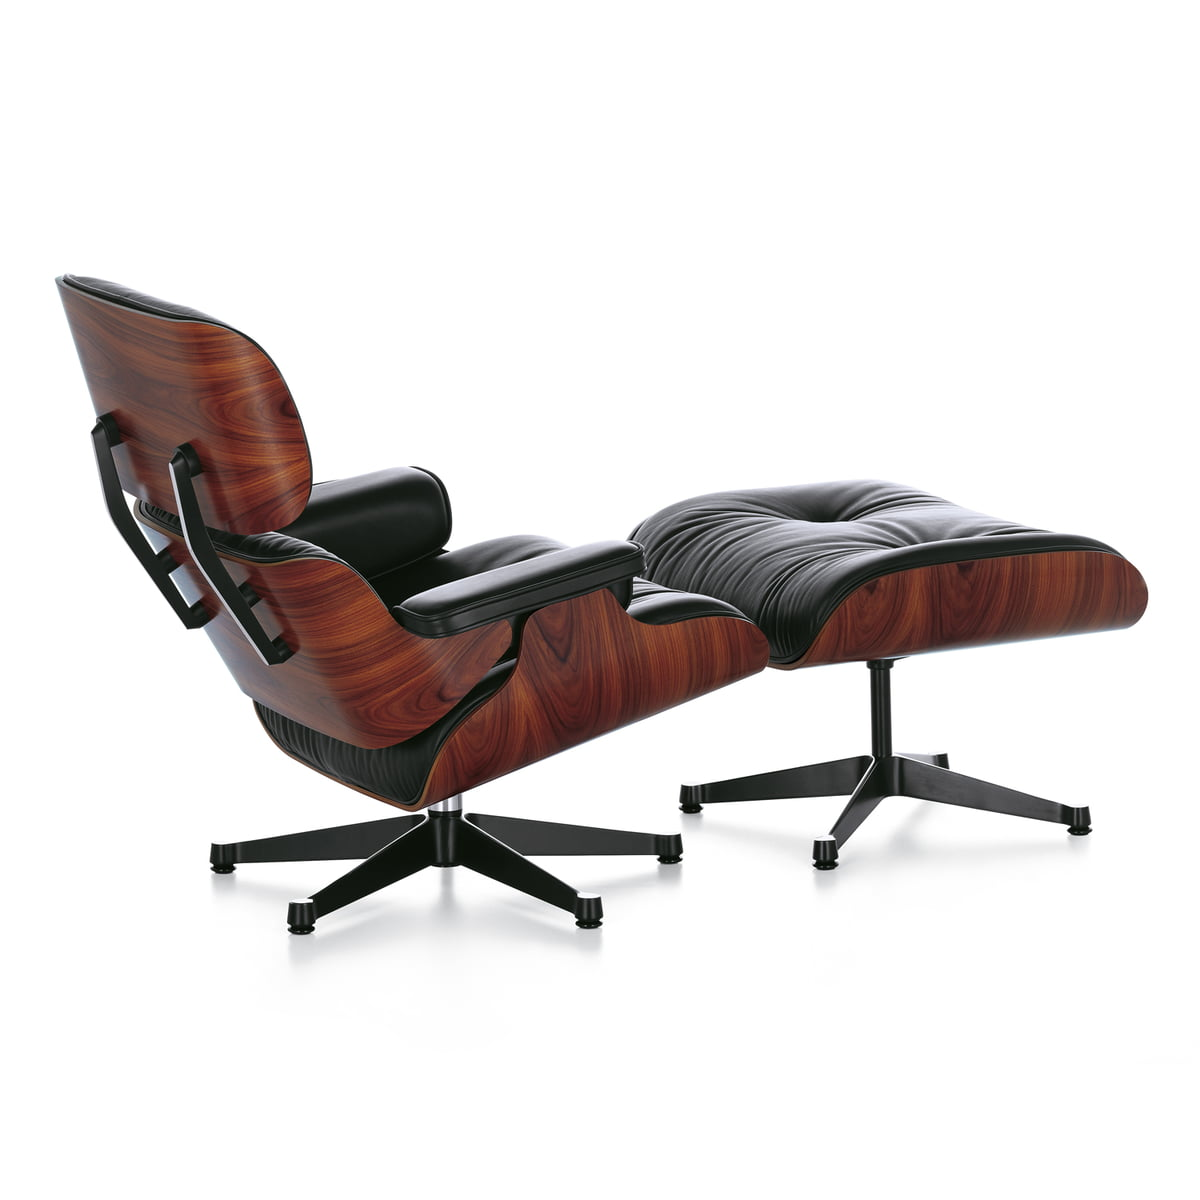 lounge chair  ottoman  santos rosewood - vitra  lounge chair  ottoman  santos rosewood